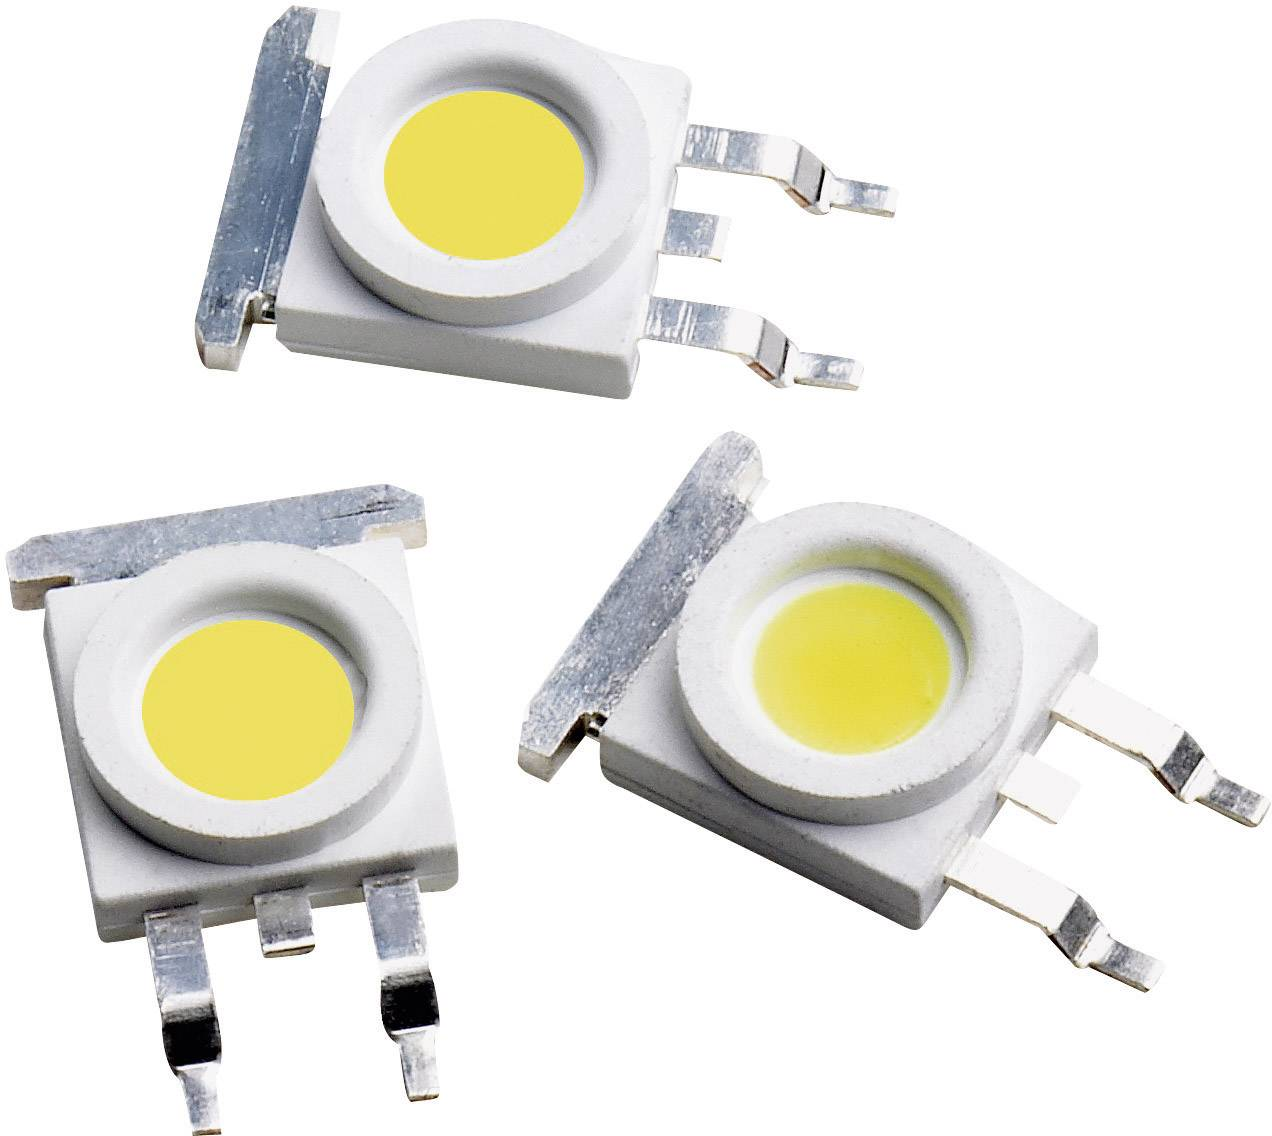 HighPower LED Broadcom 1 W, 105 lm, 3.2 V, 350 mA, chladná biela